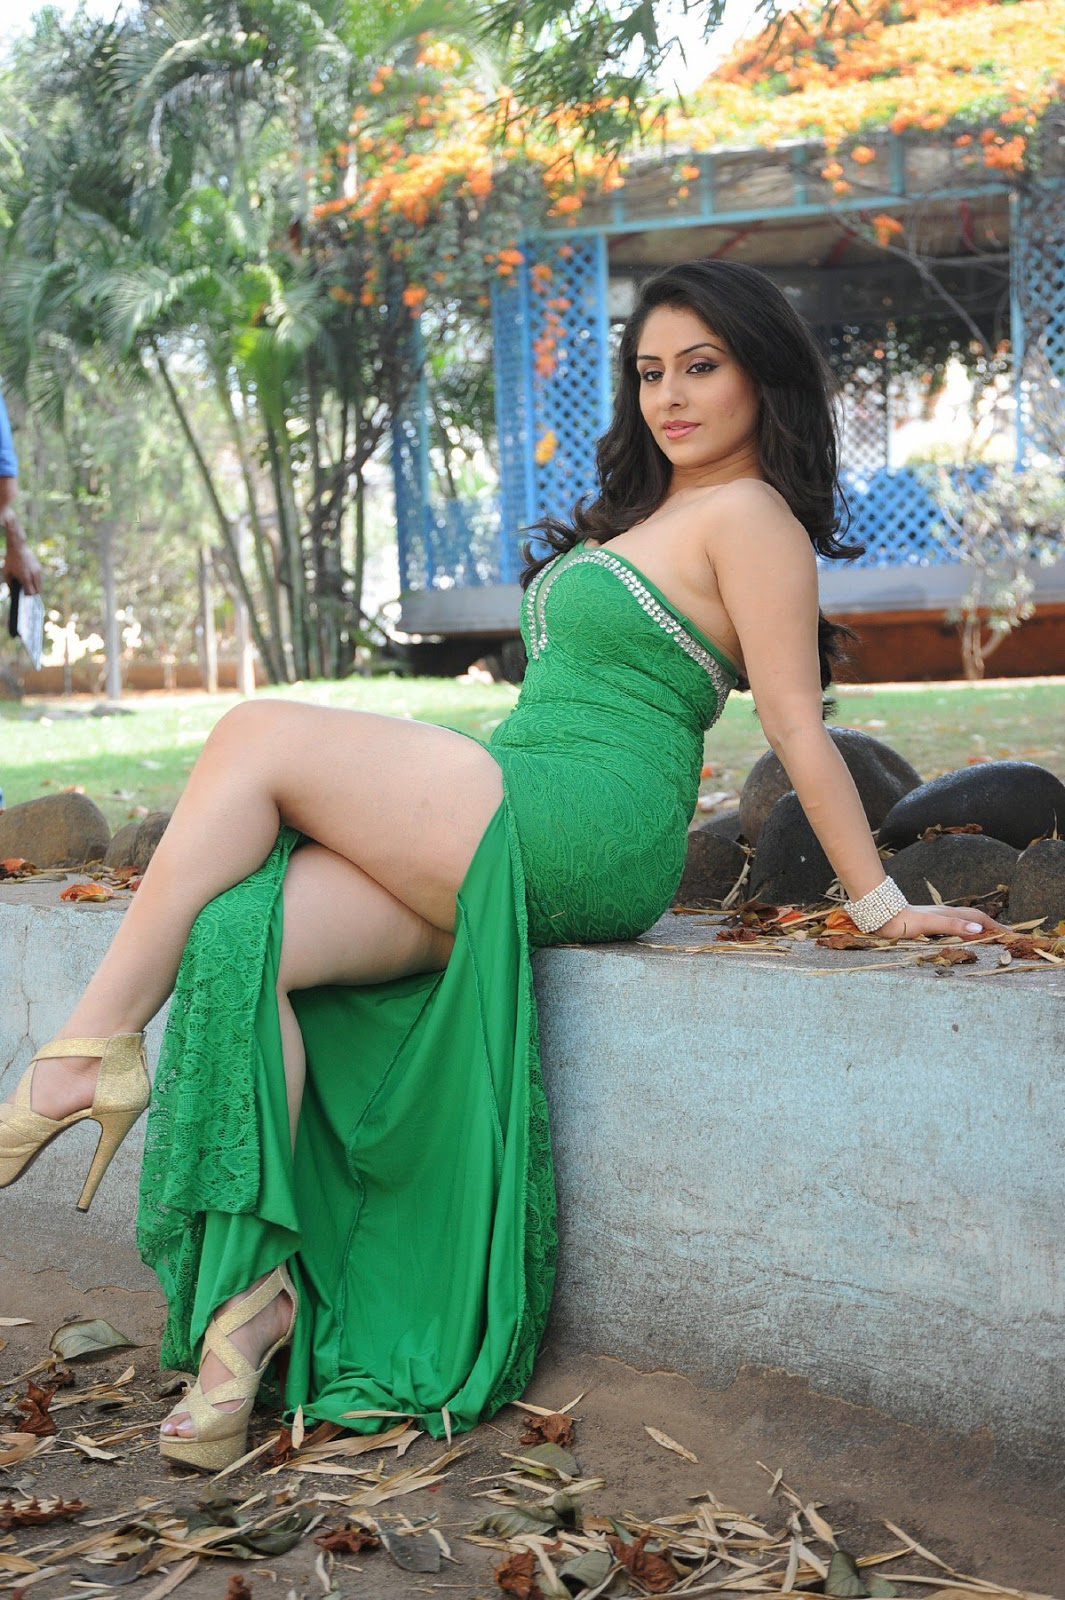 Ankita Sharma naked (68 foto and video), Topless, Paparazzi, Feet, bra 2015